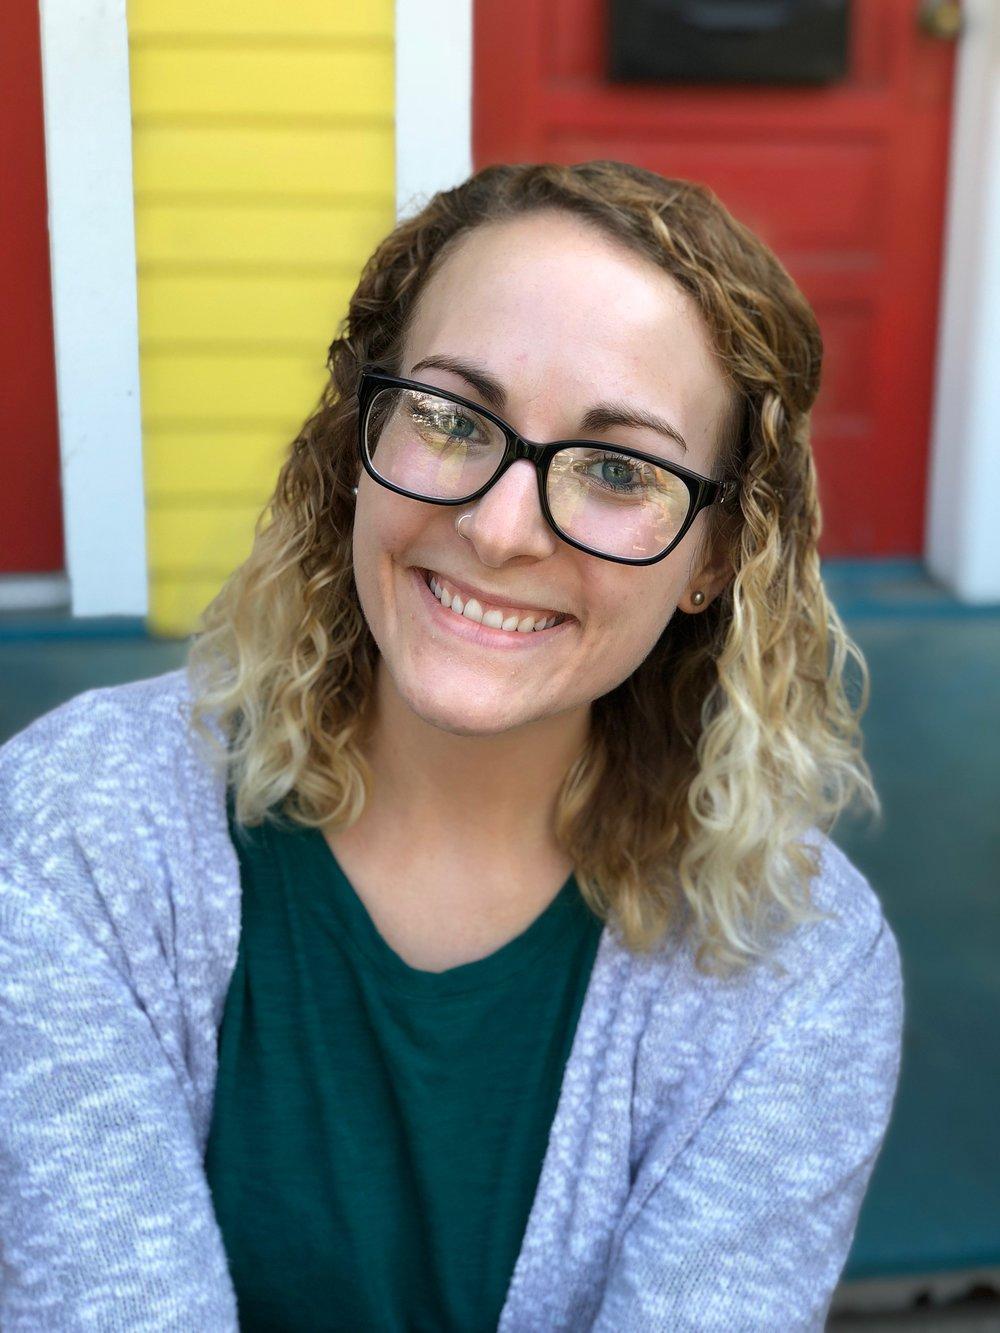 Cassandra Westpfahl - Elementary Director